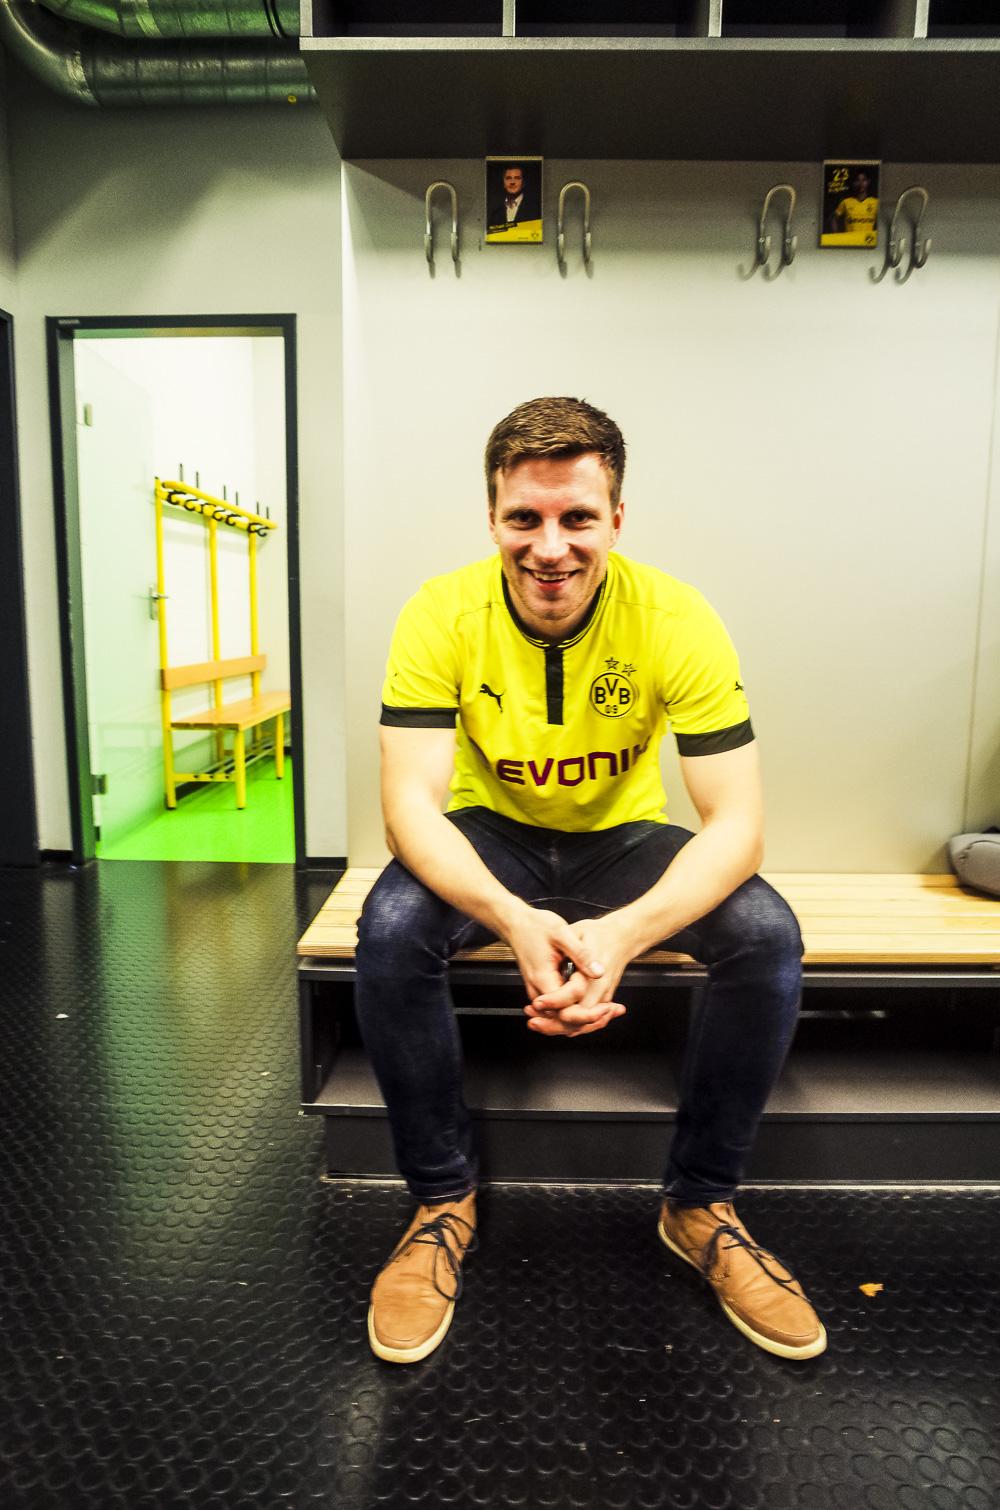 Private BVB Stadiontour im Signal Iduna Park in Dortmund Mannschaftskabine